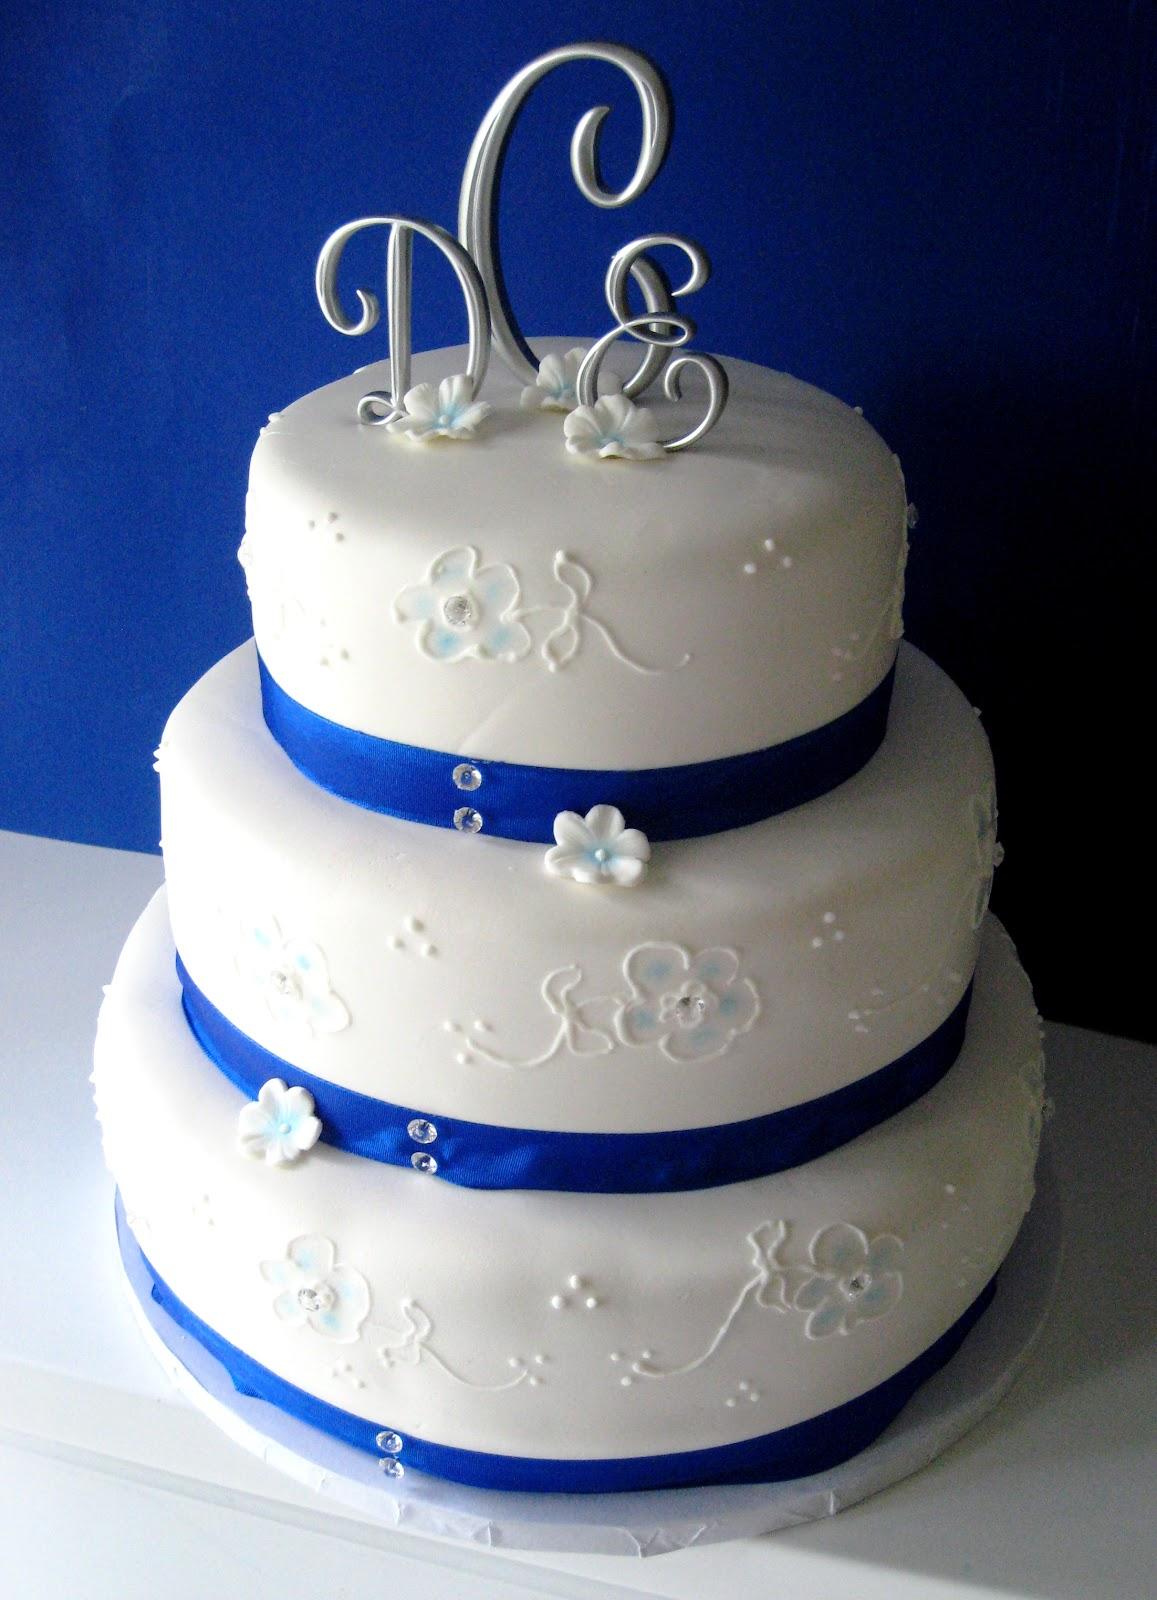 Heavenly Bites Cakes White & Blue Wedding Cake